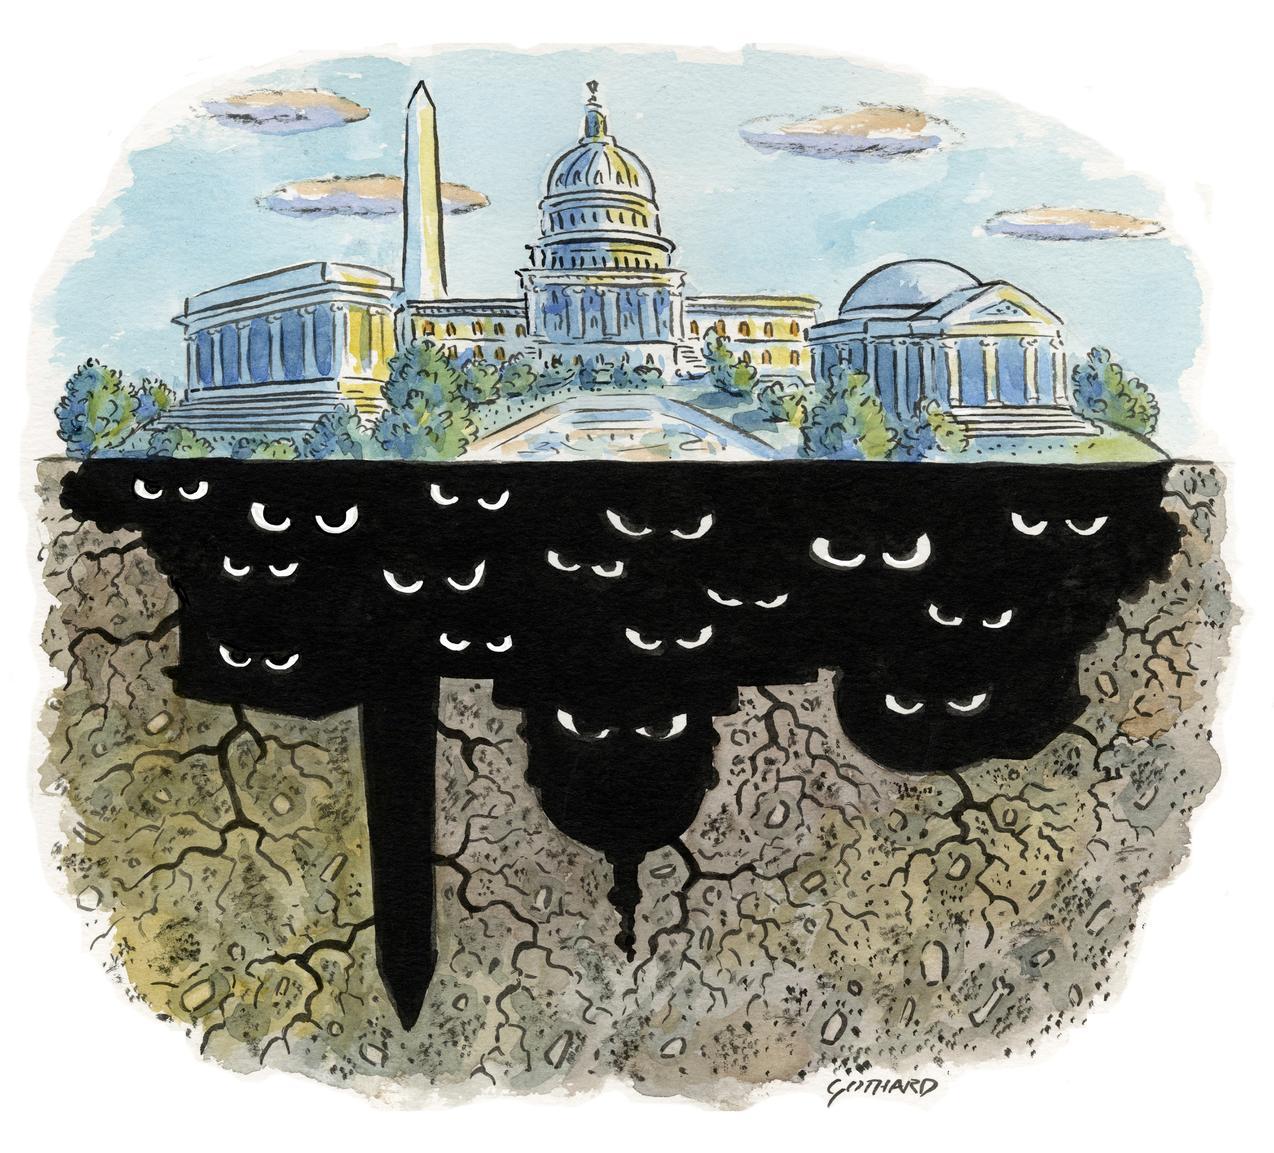 Про державу та deep state